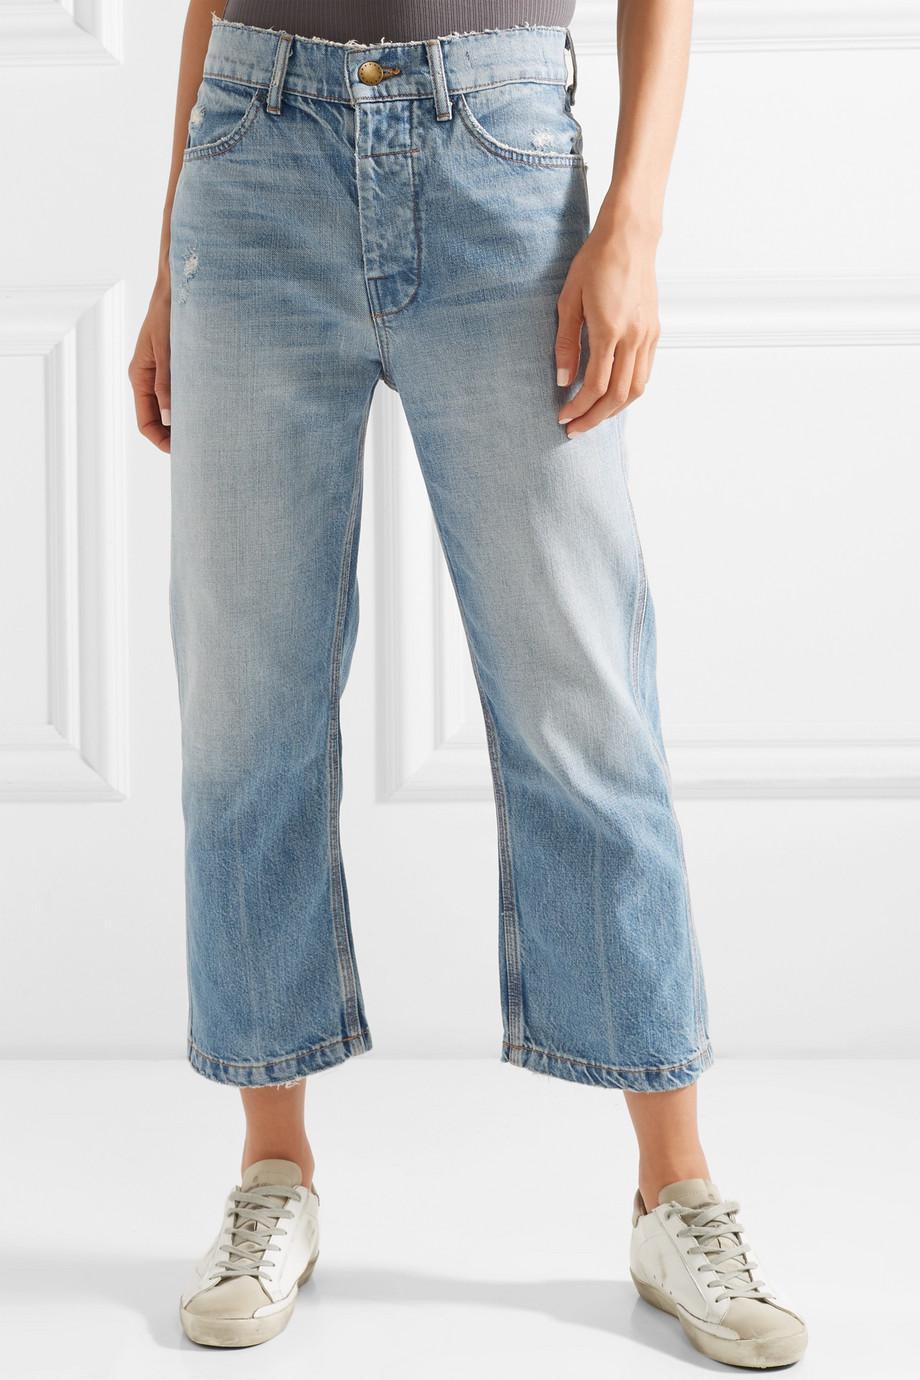 The Railroad Cropped Distressed Boyfriend Jeans - Mid denim The Great. eS81MkV